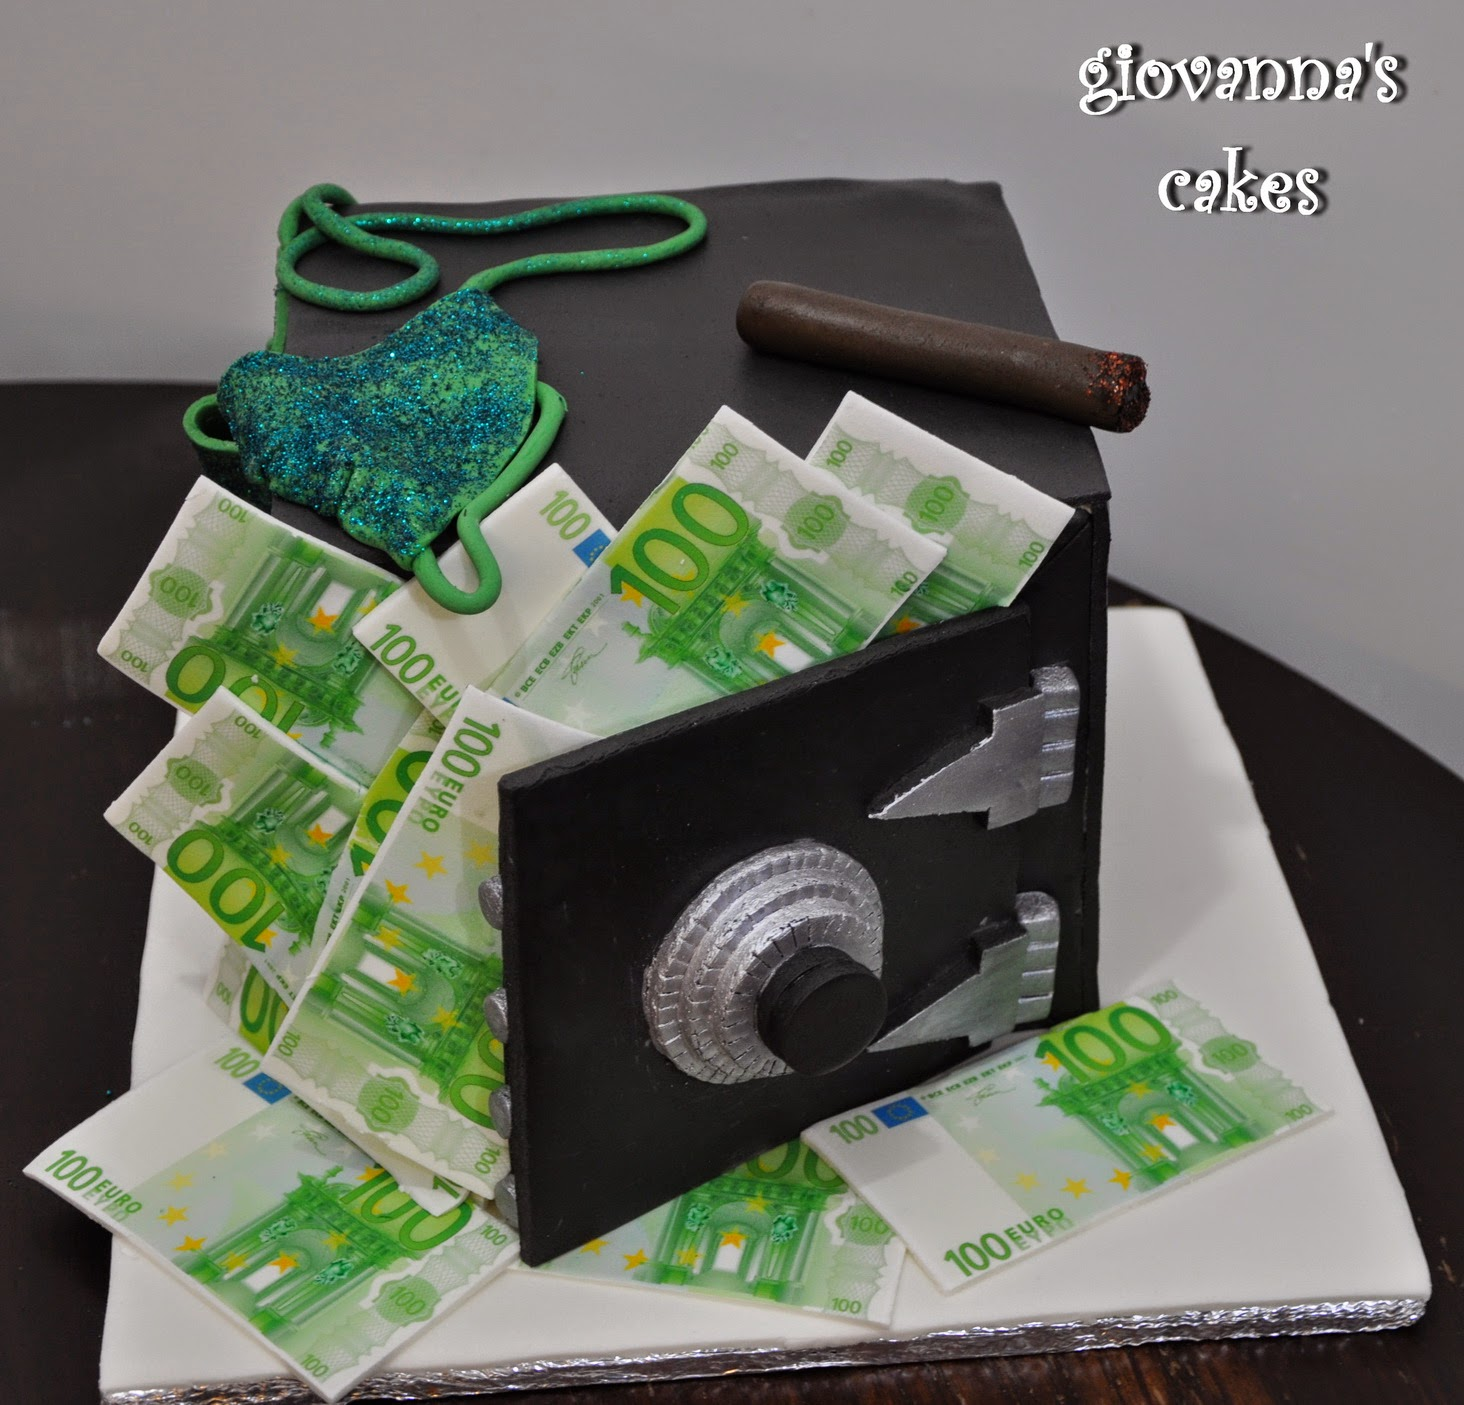 Giovannas Cakes Money In The Seif Birthday Cake